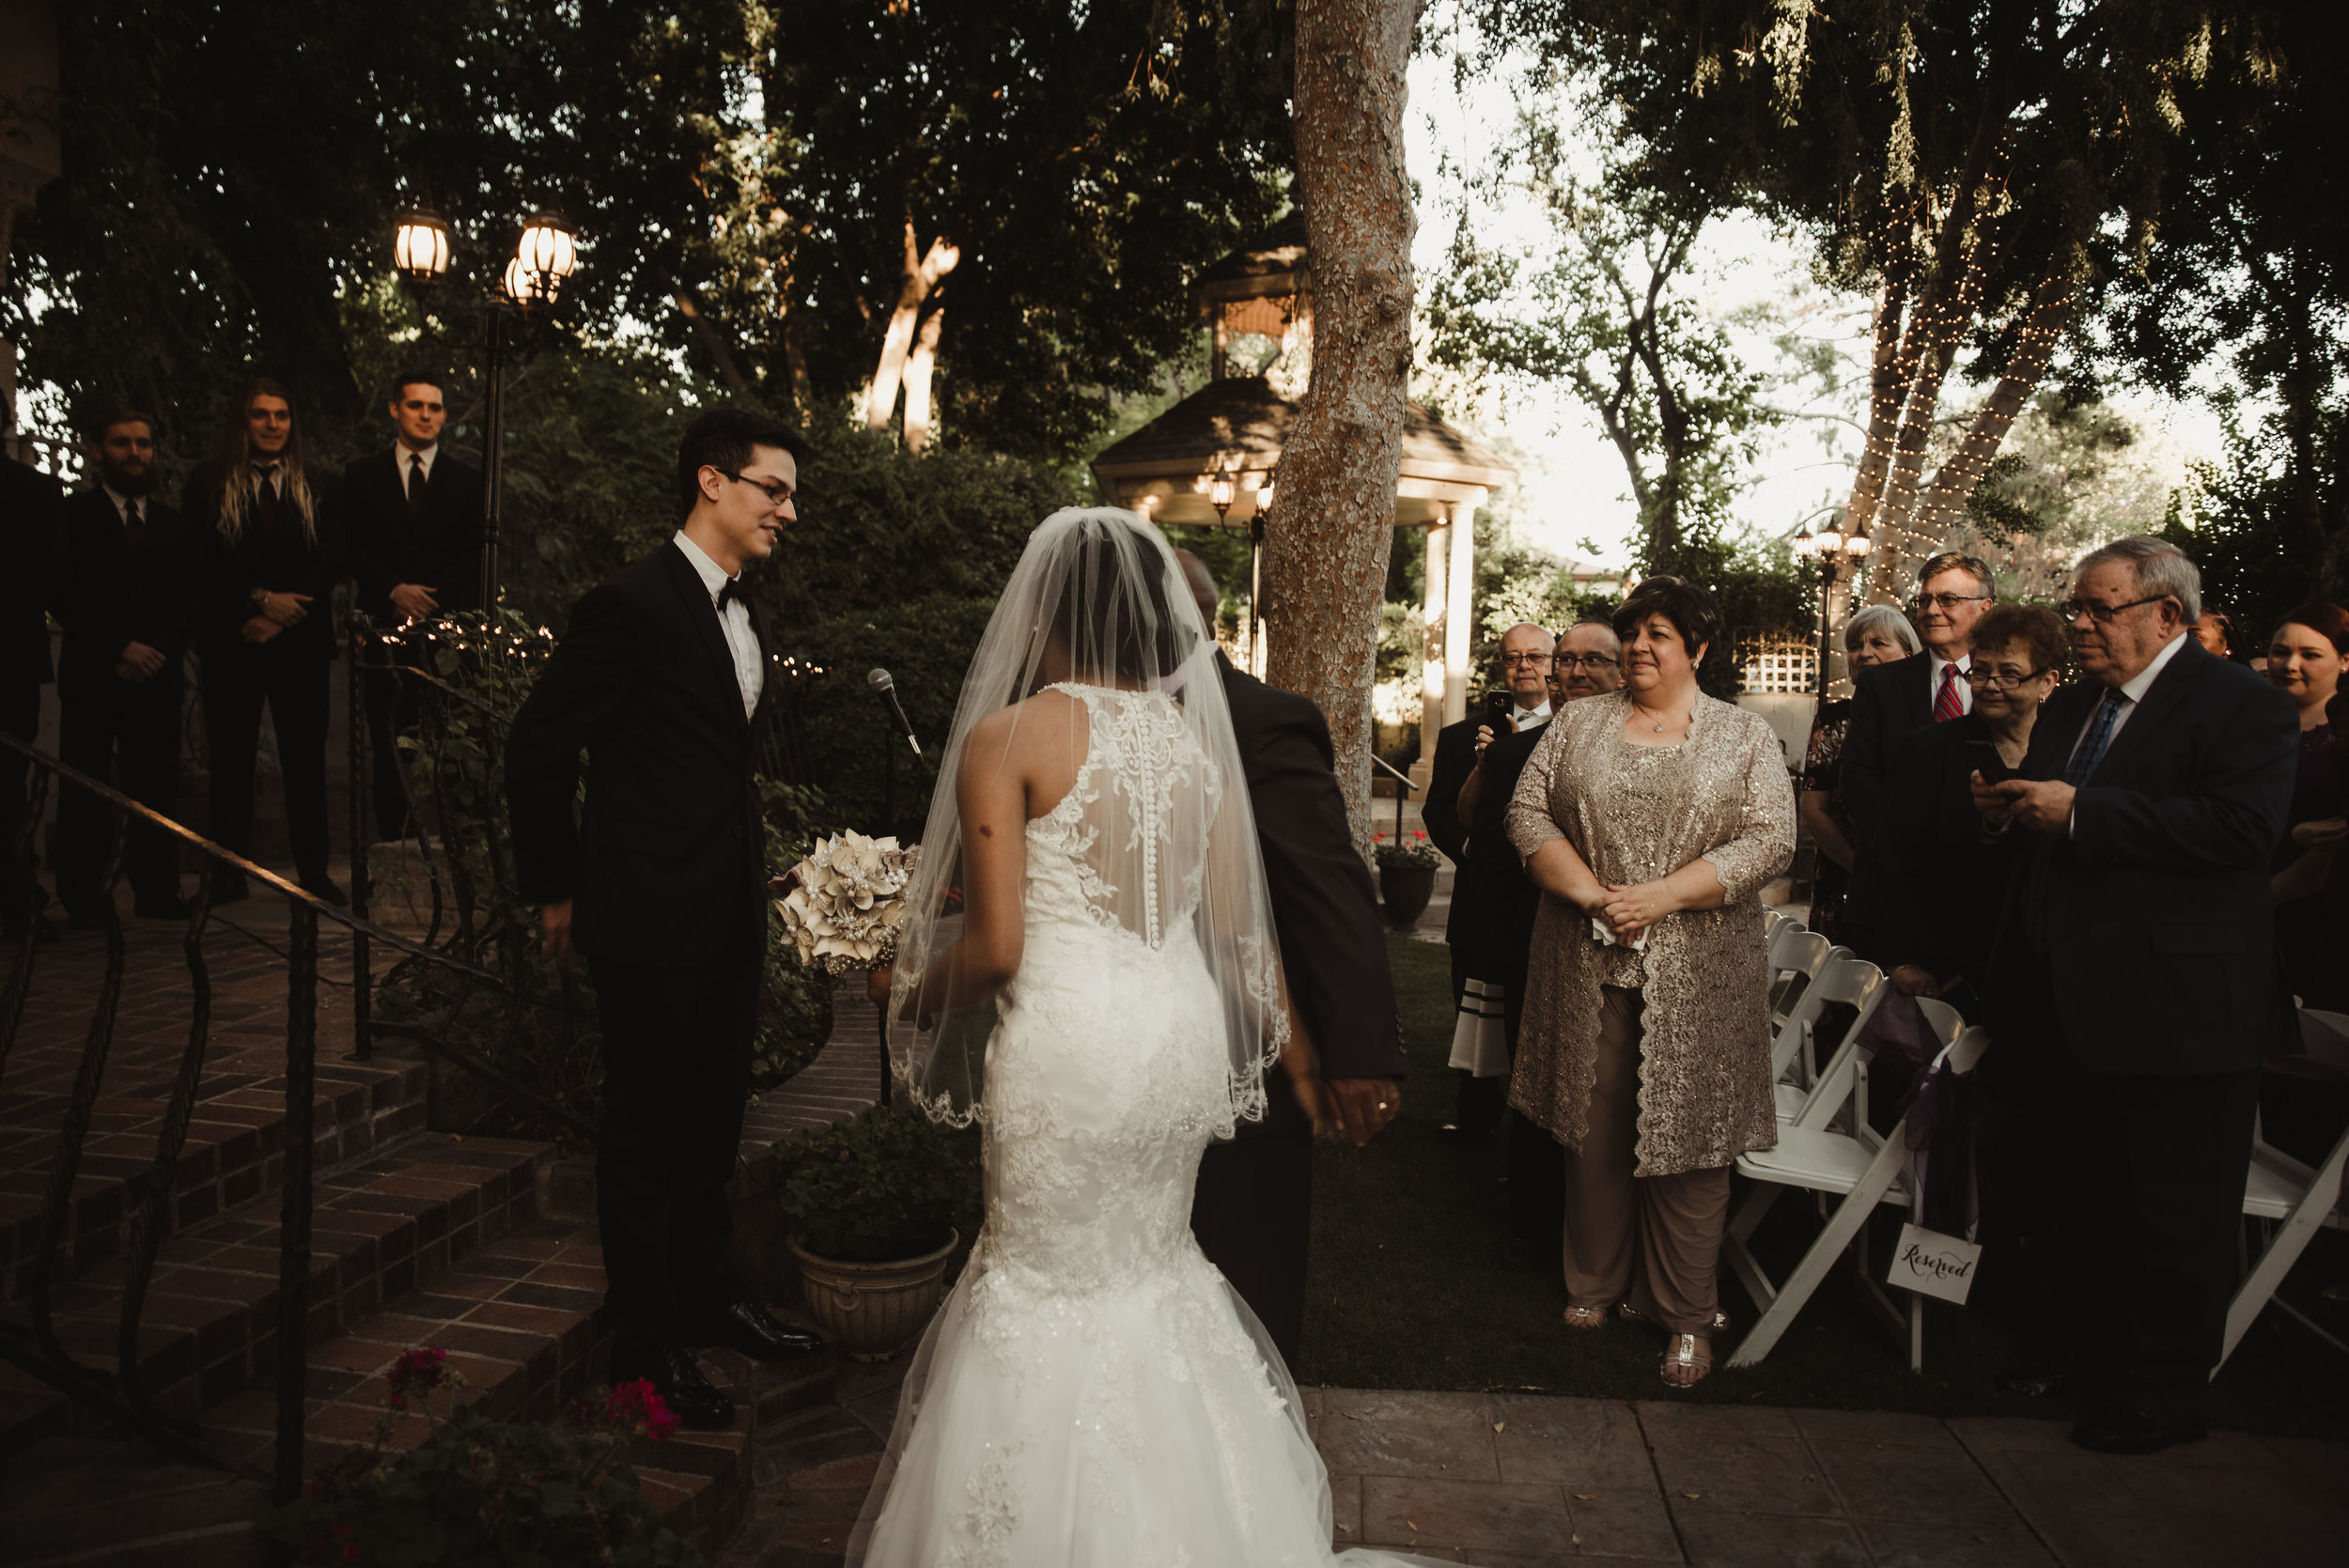 Vanessa+JoshWedding++++-250.jpg